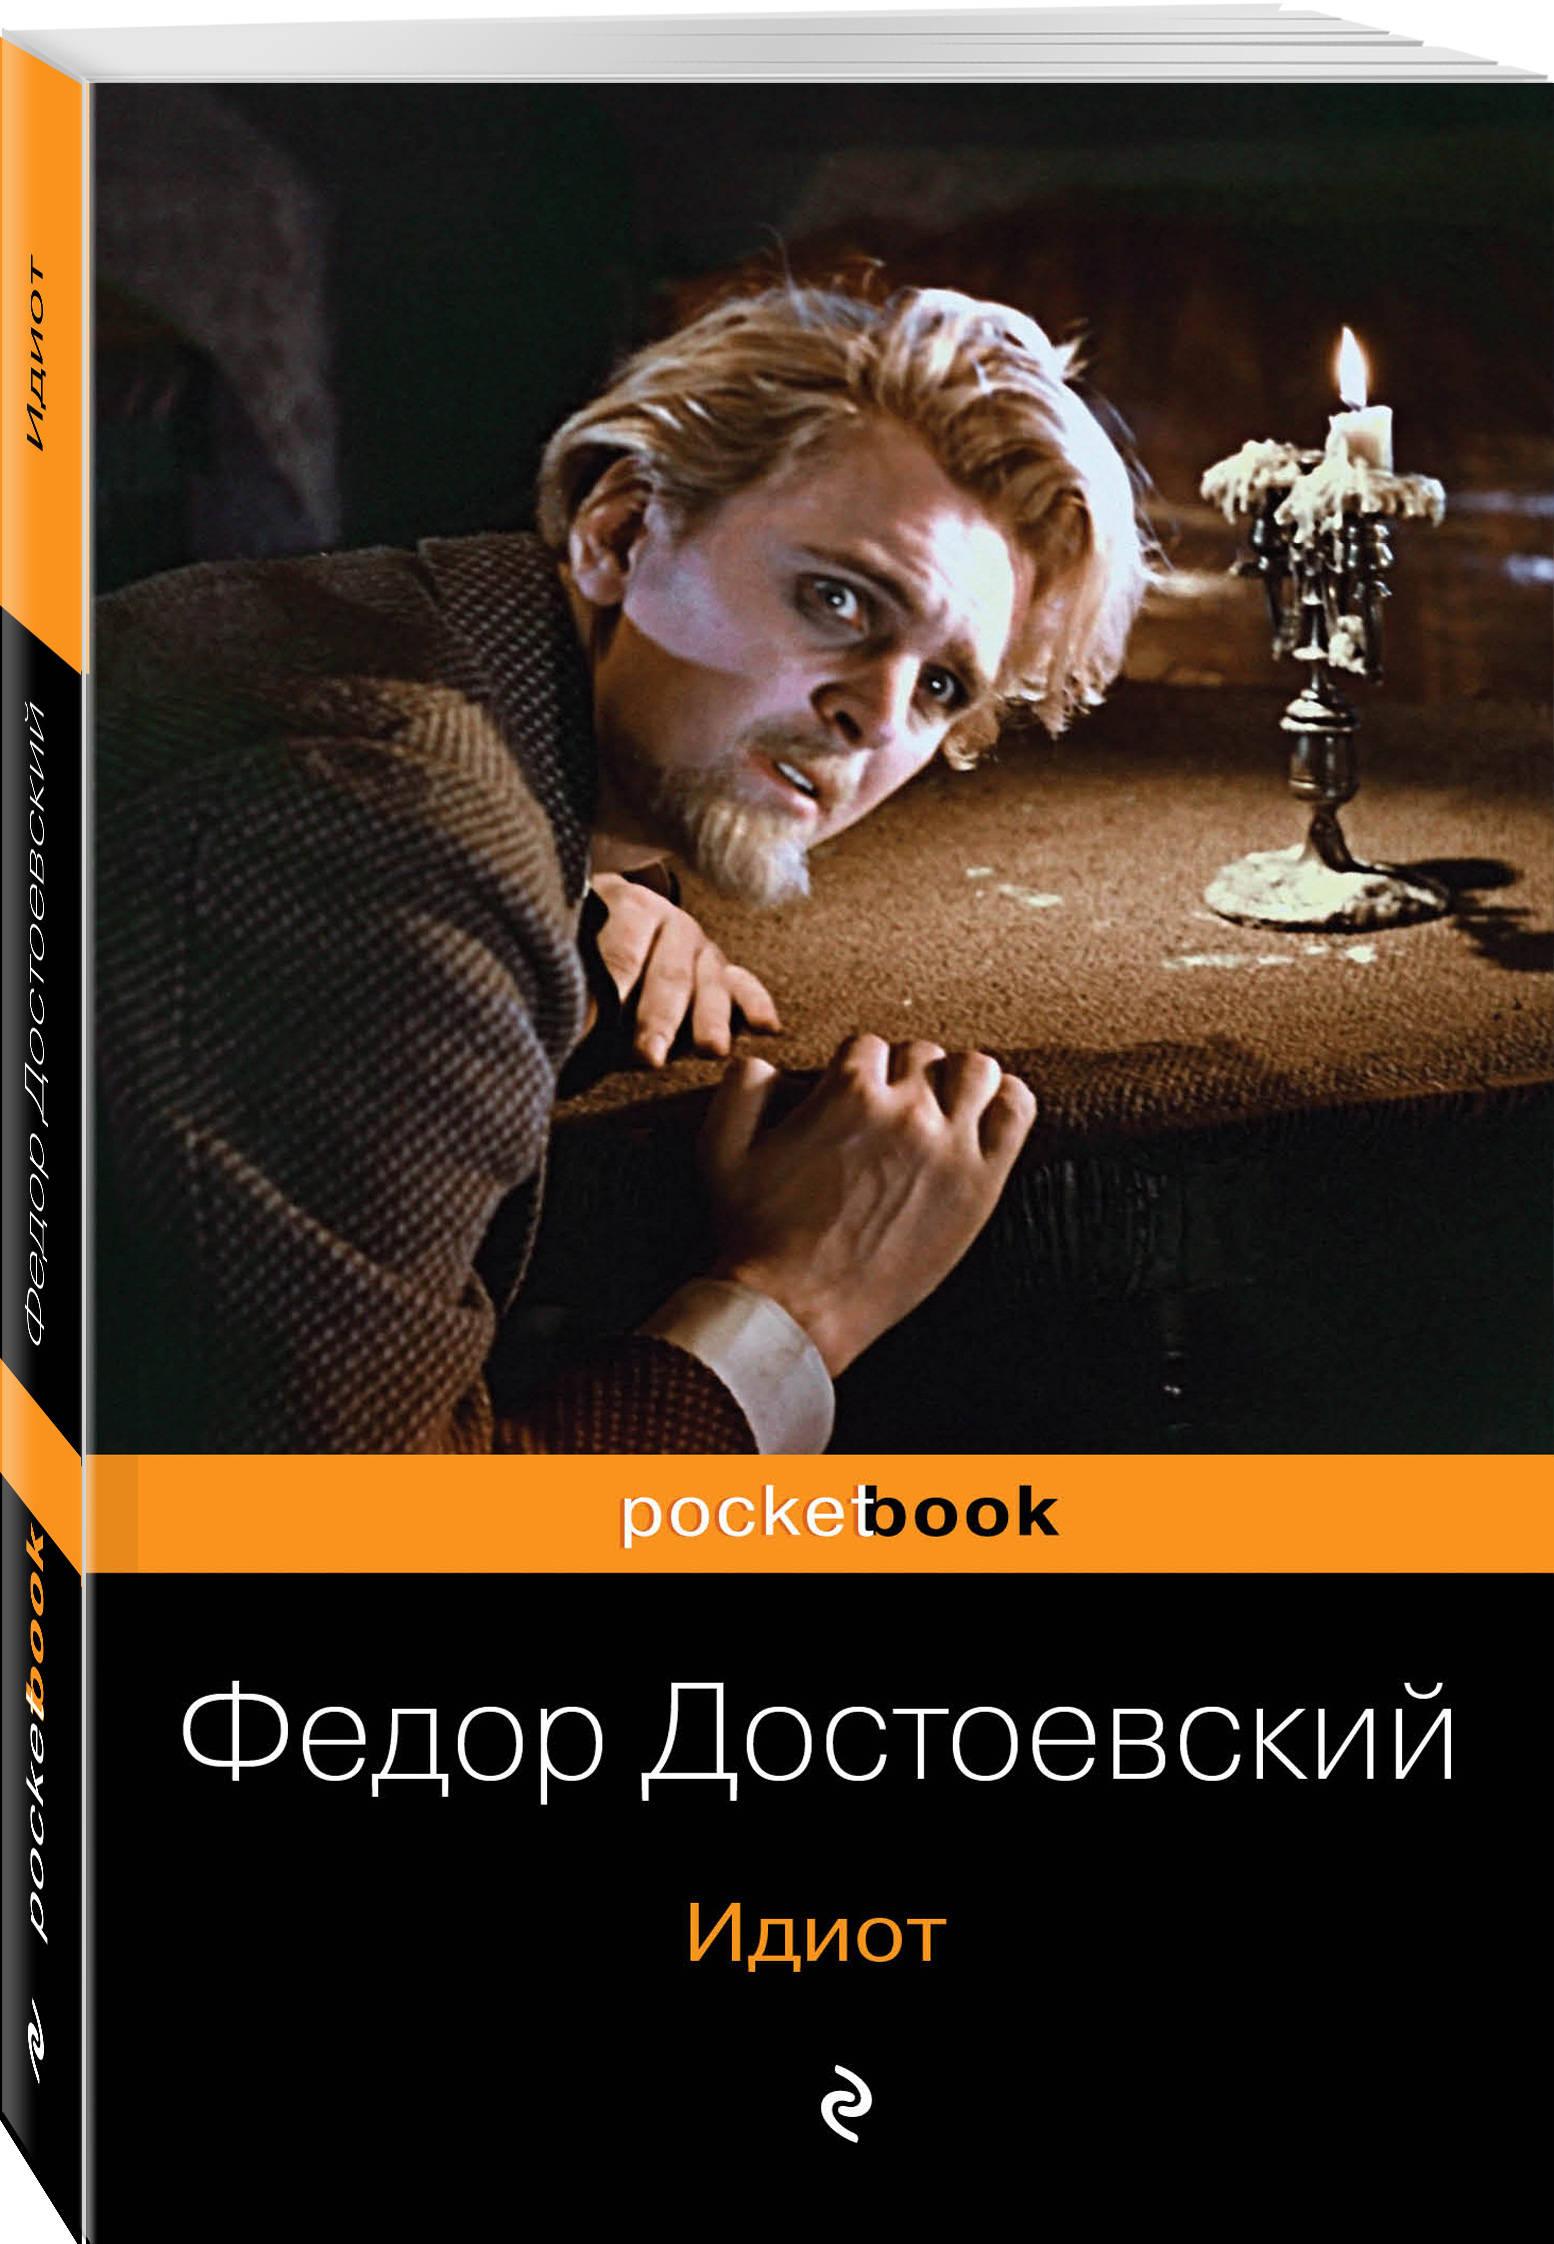 Достоевский Ф.М. Идиот идиот 4cdmp3